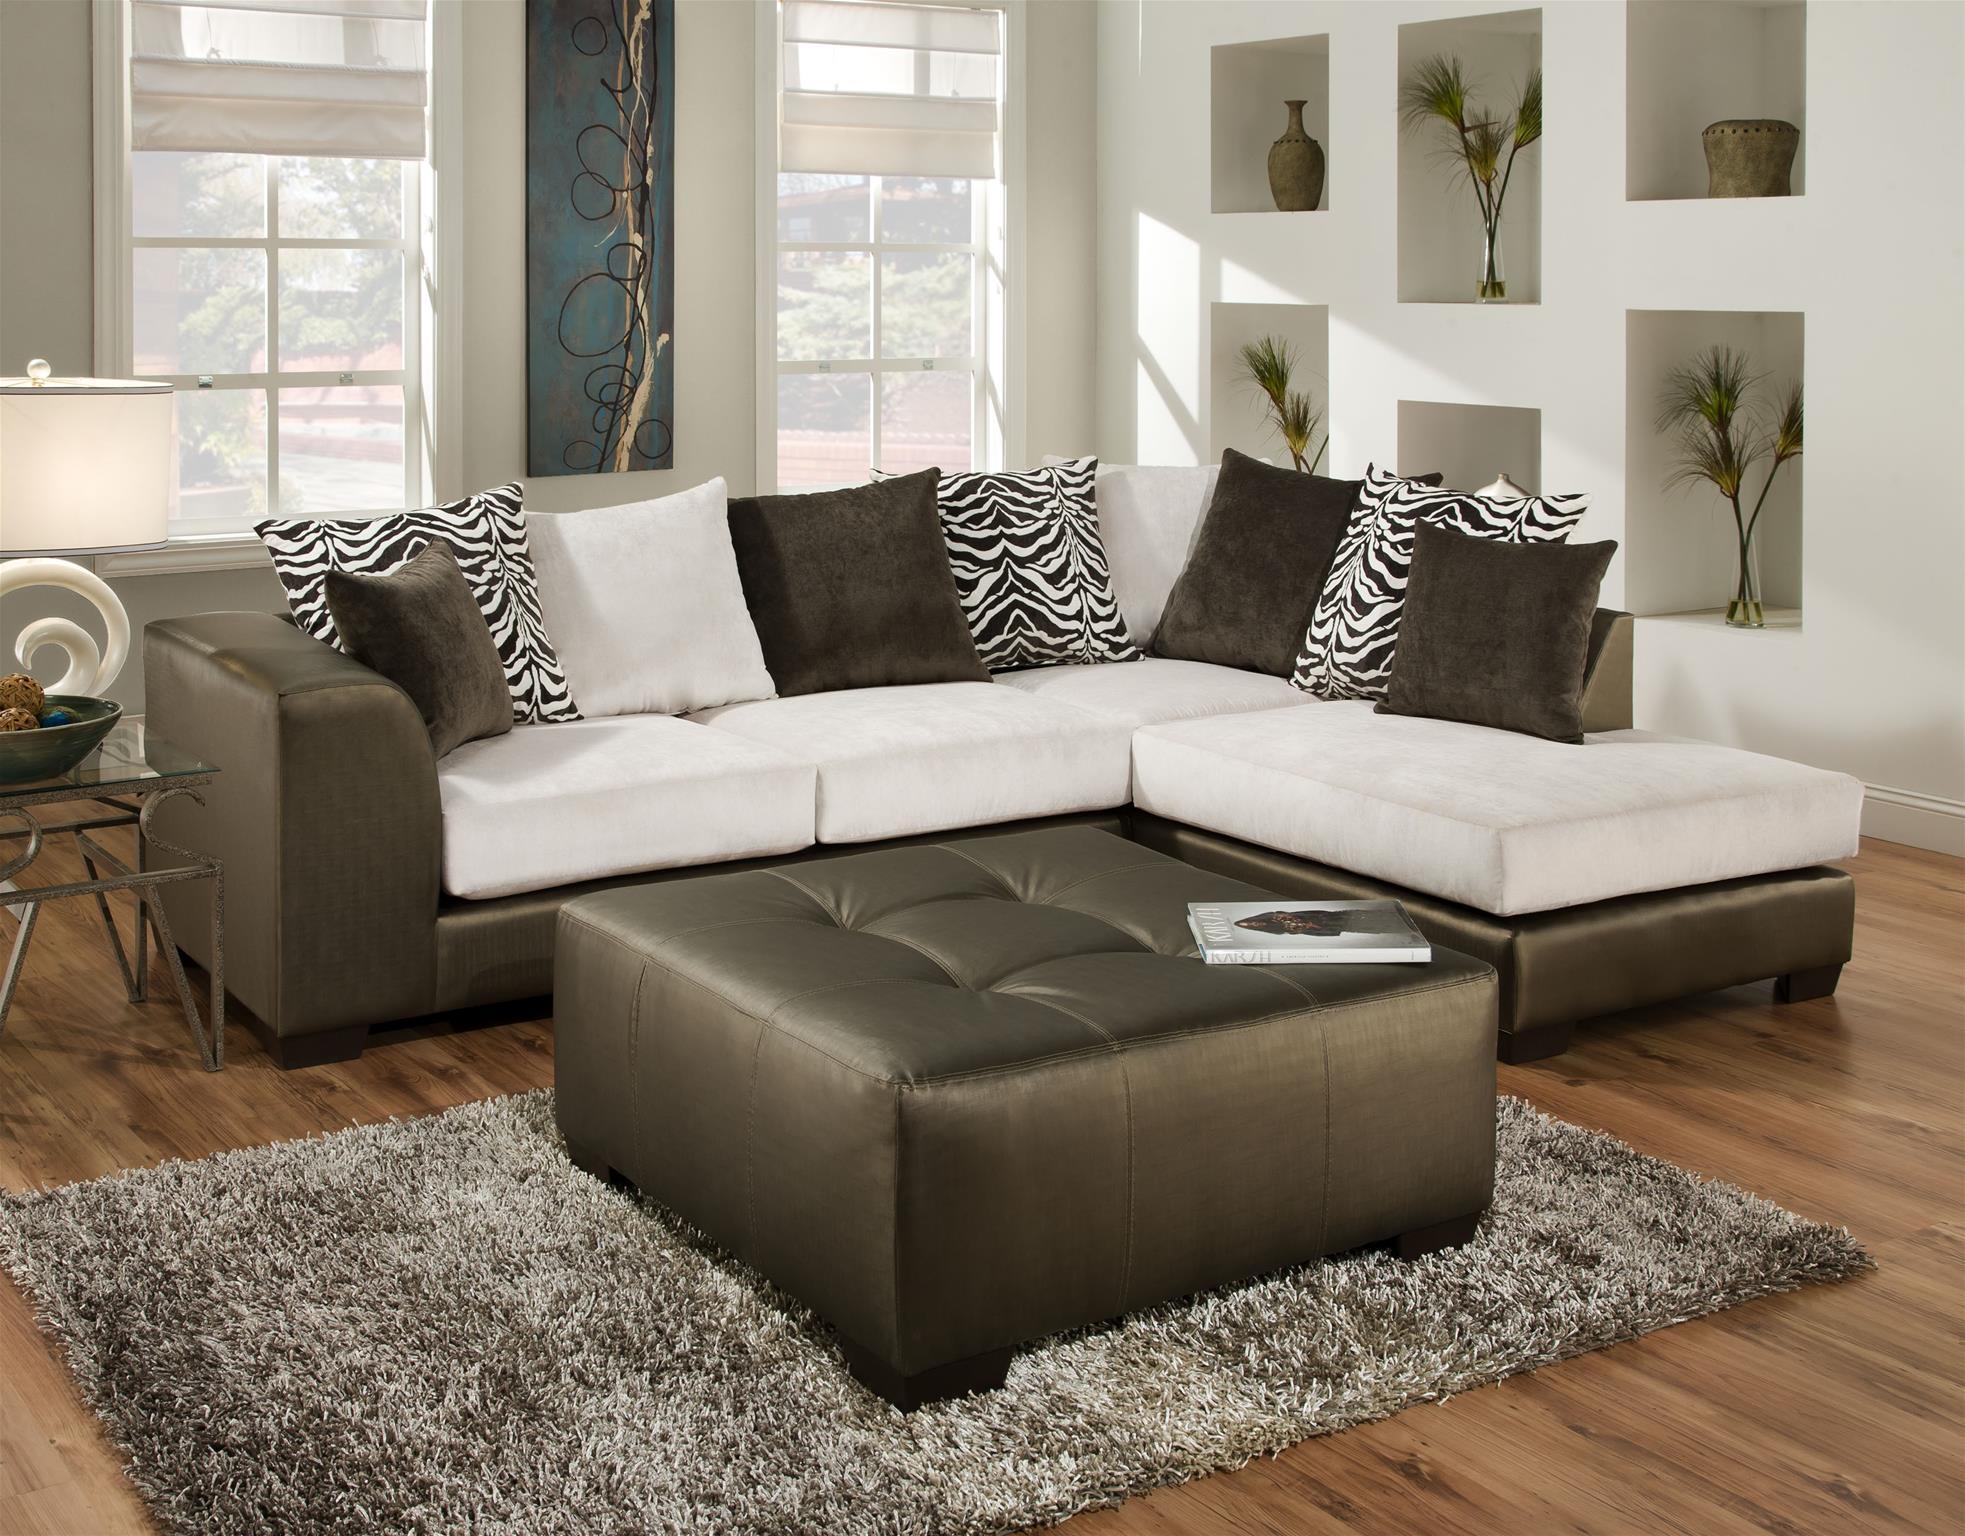 beautiful sofa sets milo baughman curved 15 43 diana dark brown leather sectional set ideas